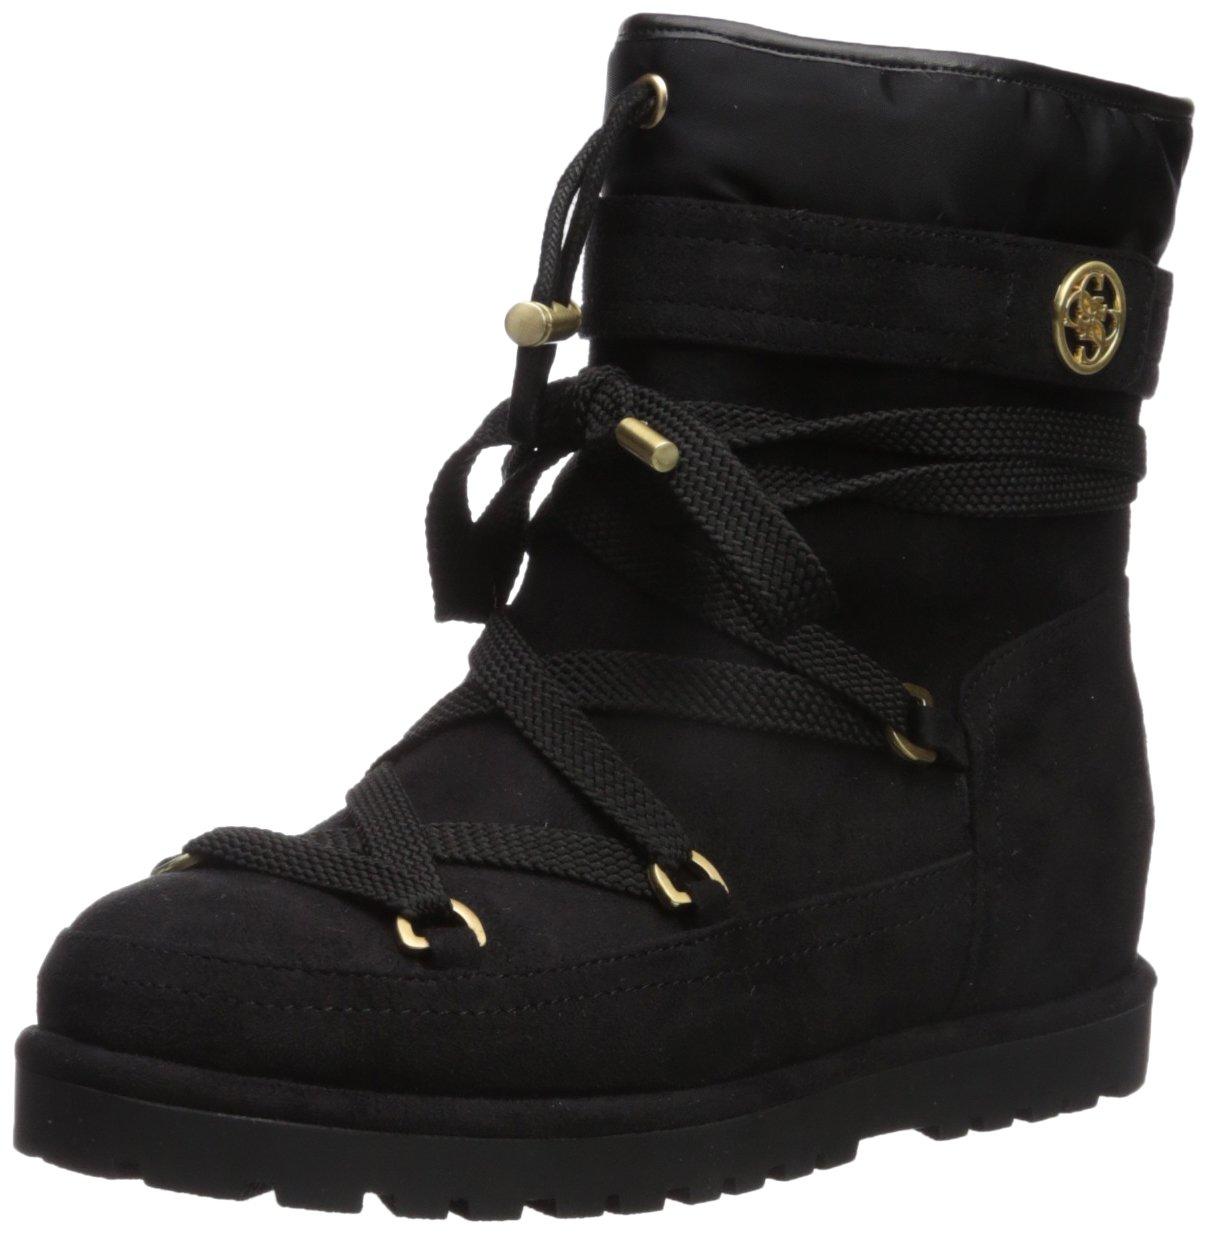 GUESS Women's Felicya Mid Calf Boot B0744QDT7H 8 B(M) US|Black